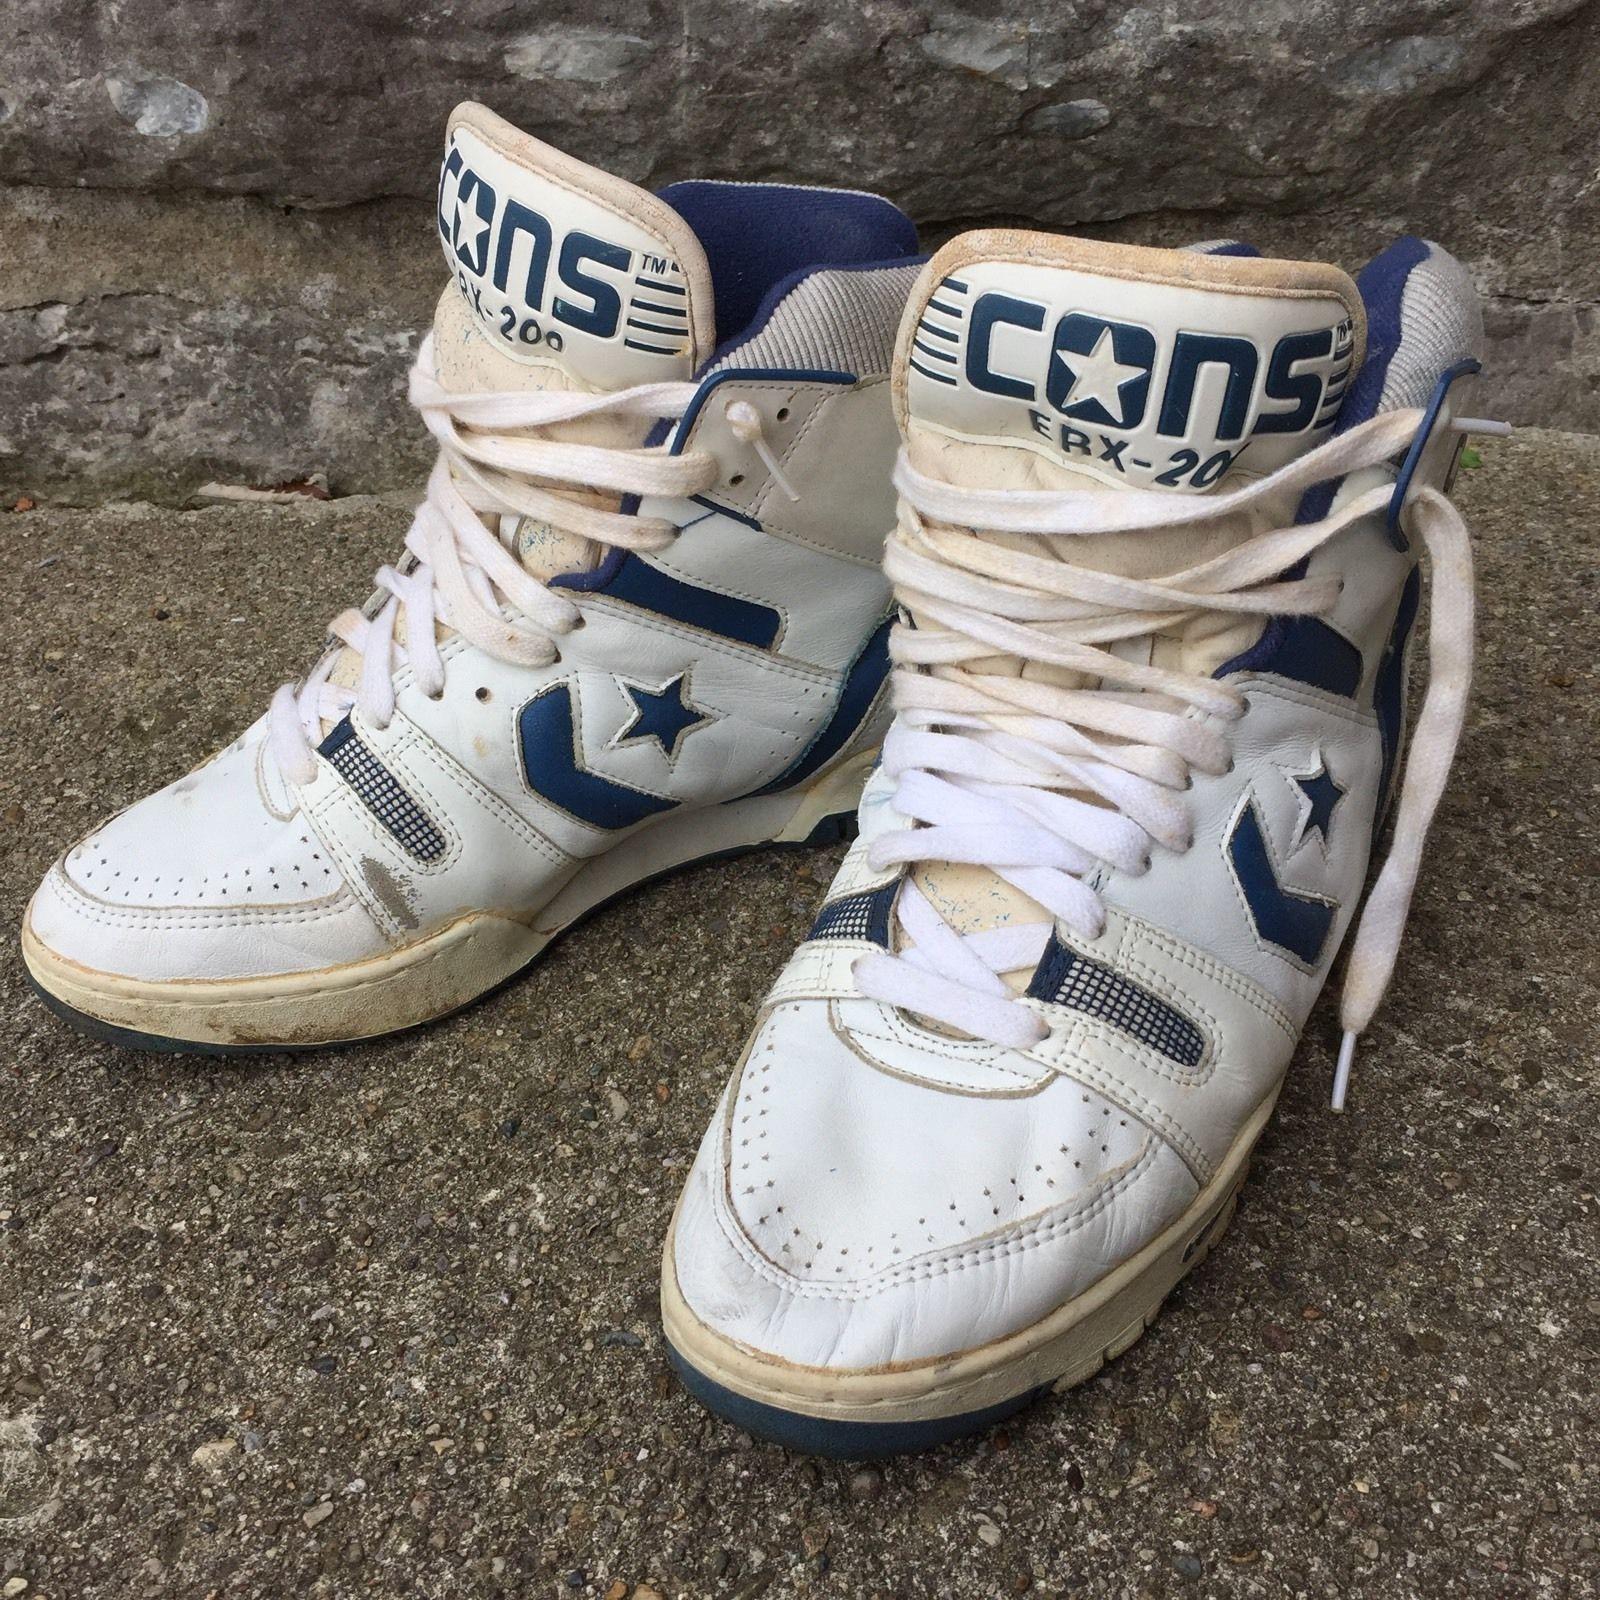 1980's Roses 200 Cons 12 Shoes Erx Size N Converse Guns Vtg nP80kOw